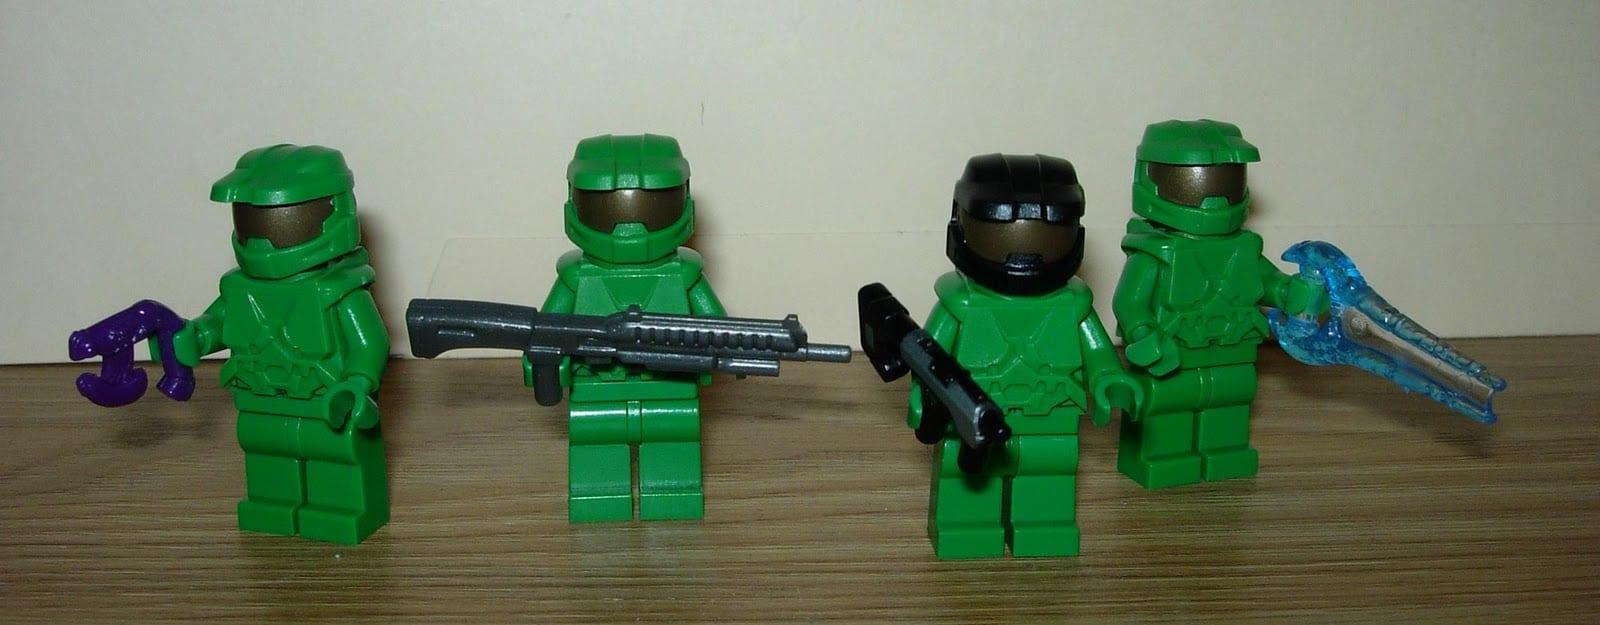 All Things Fett  Halo Lego  Or Teensy Tinsey Spartans